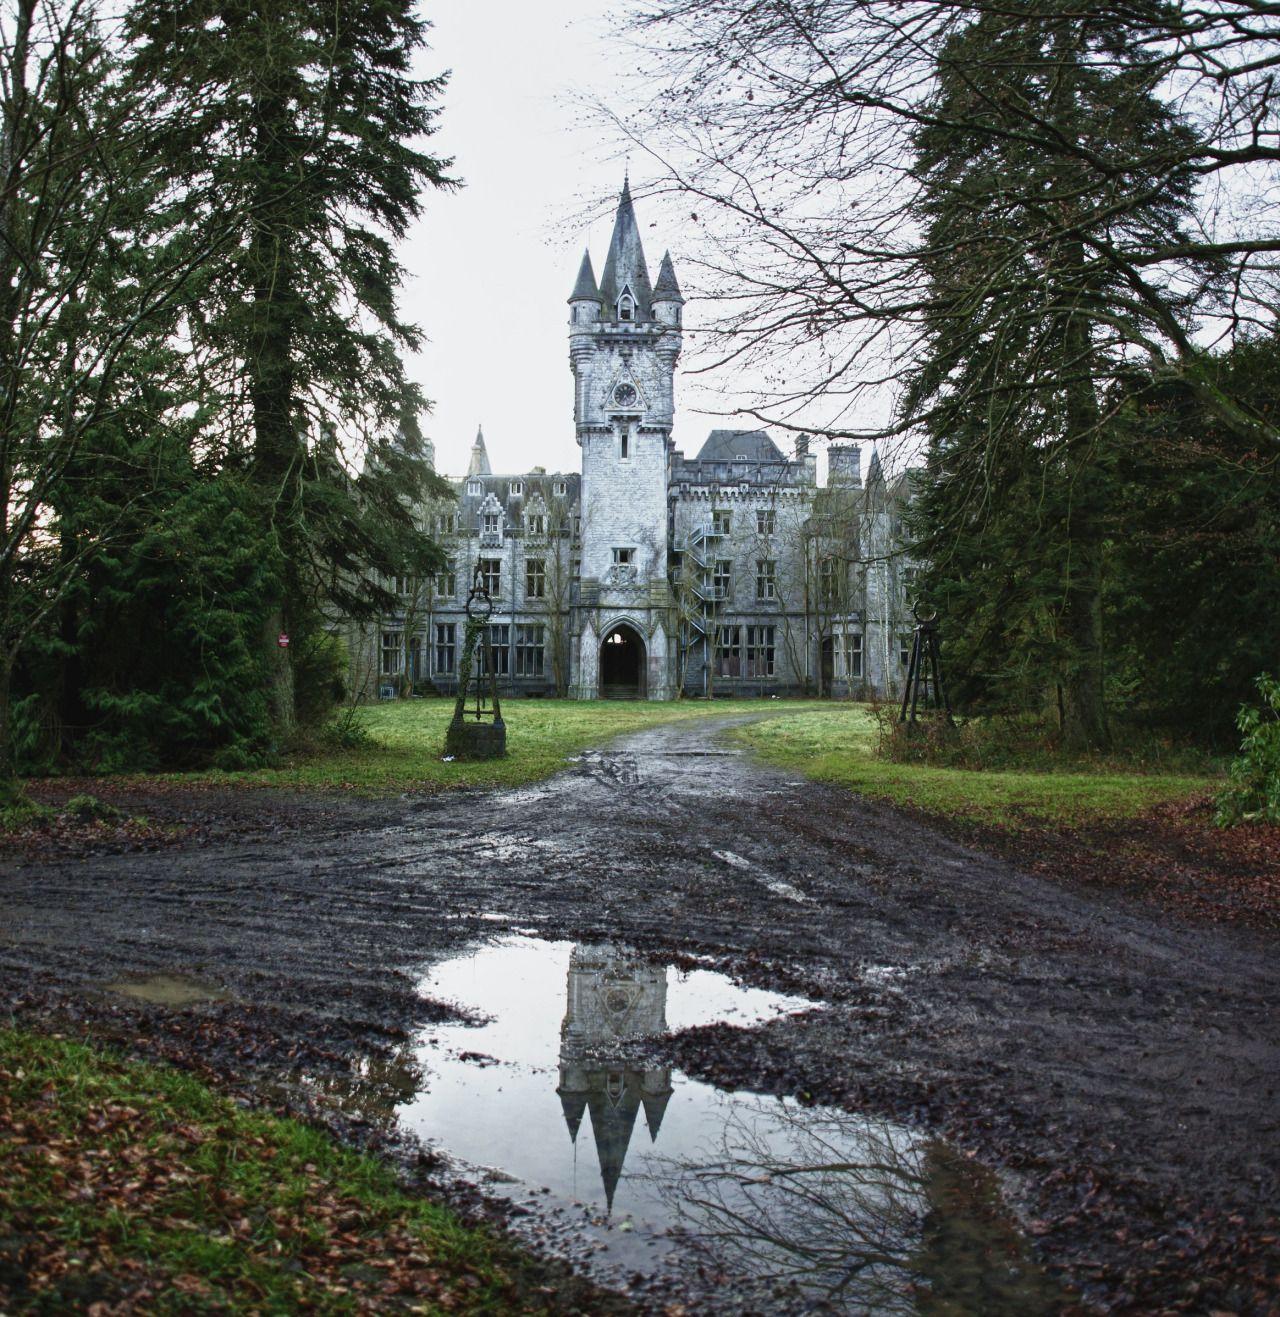 Sonya-heaney: Abandoned Castle In